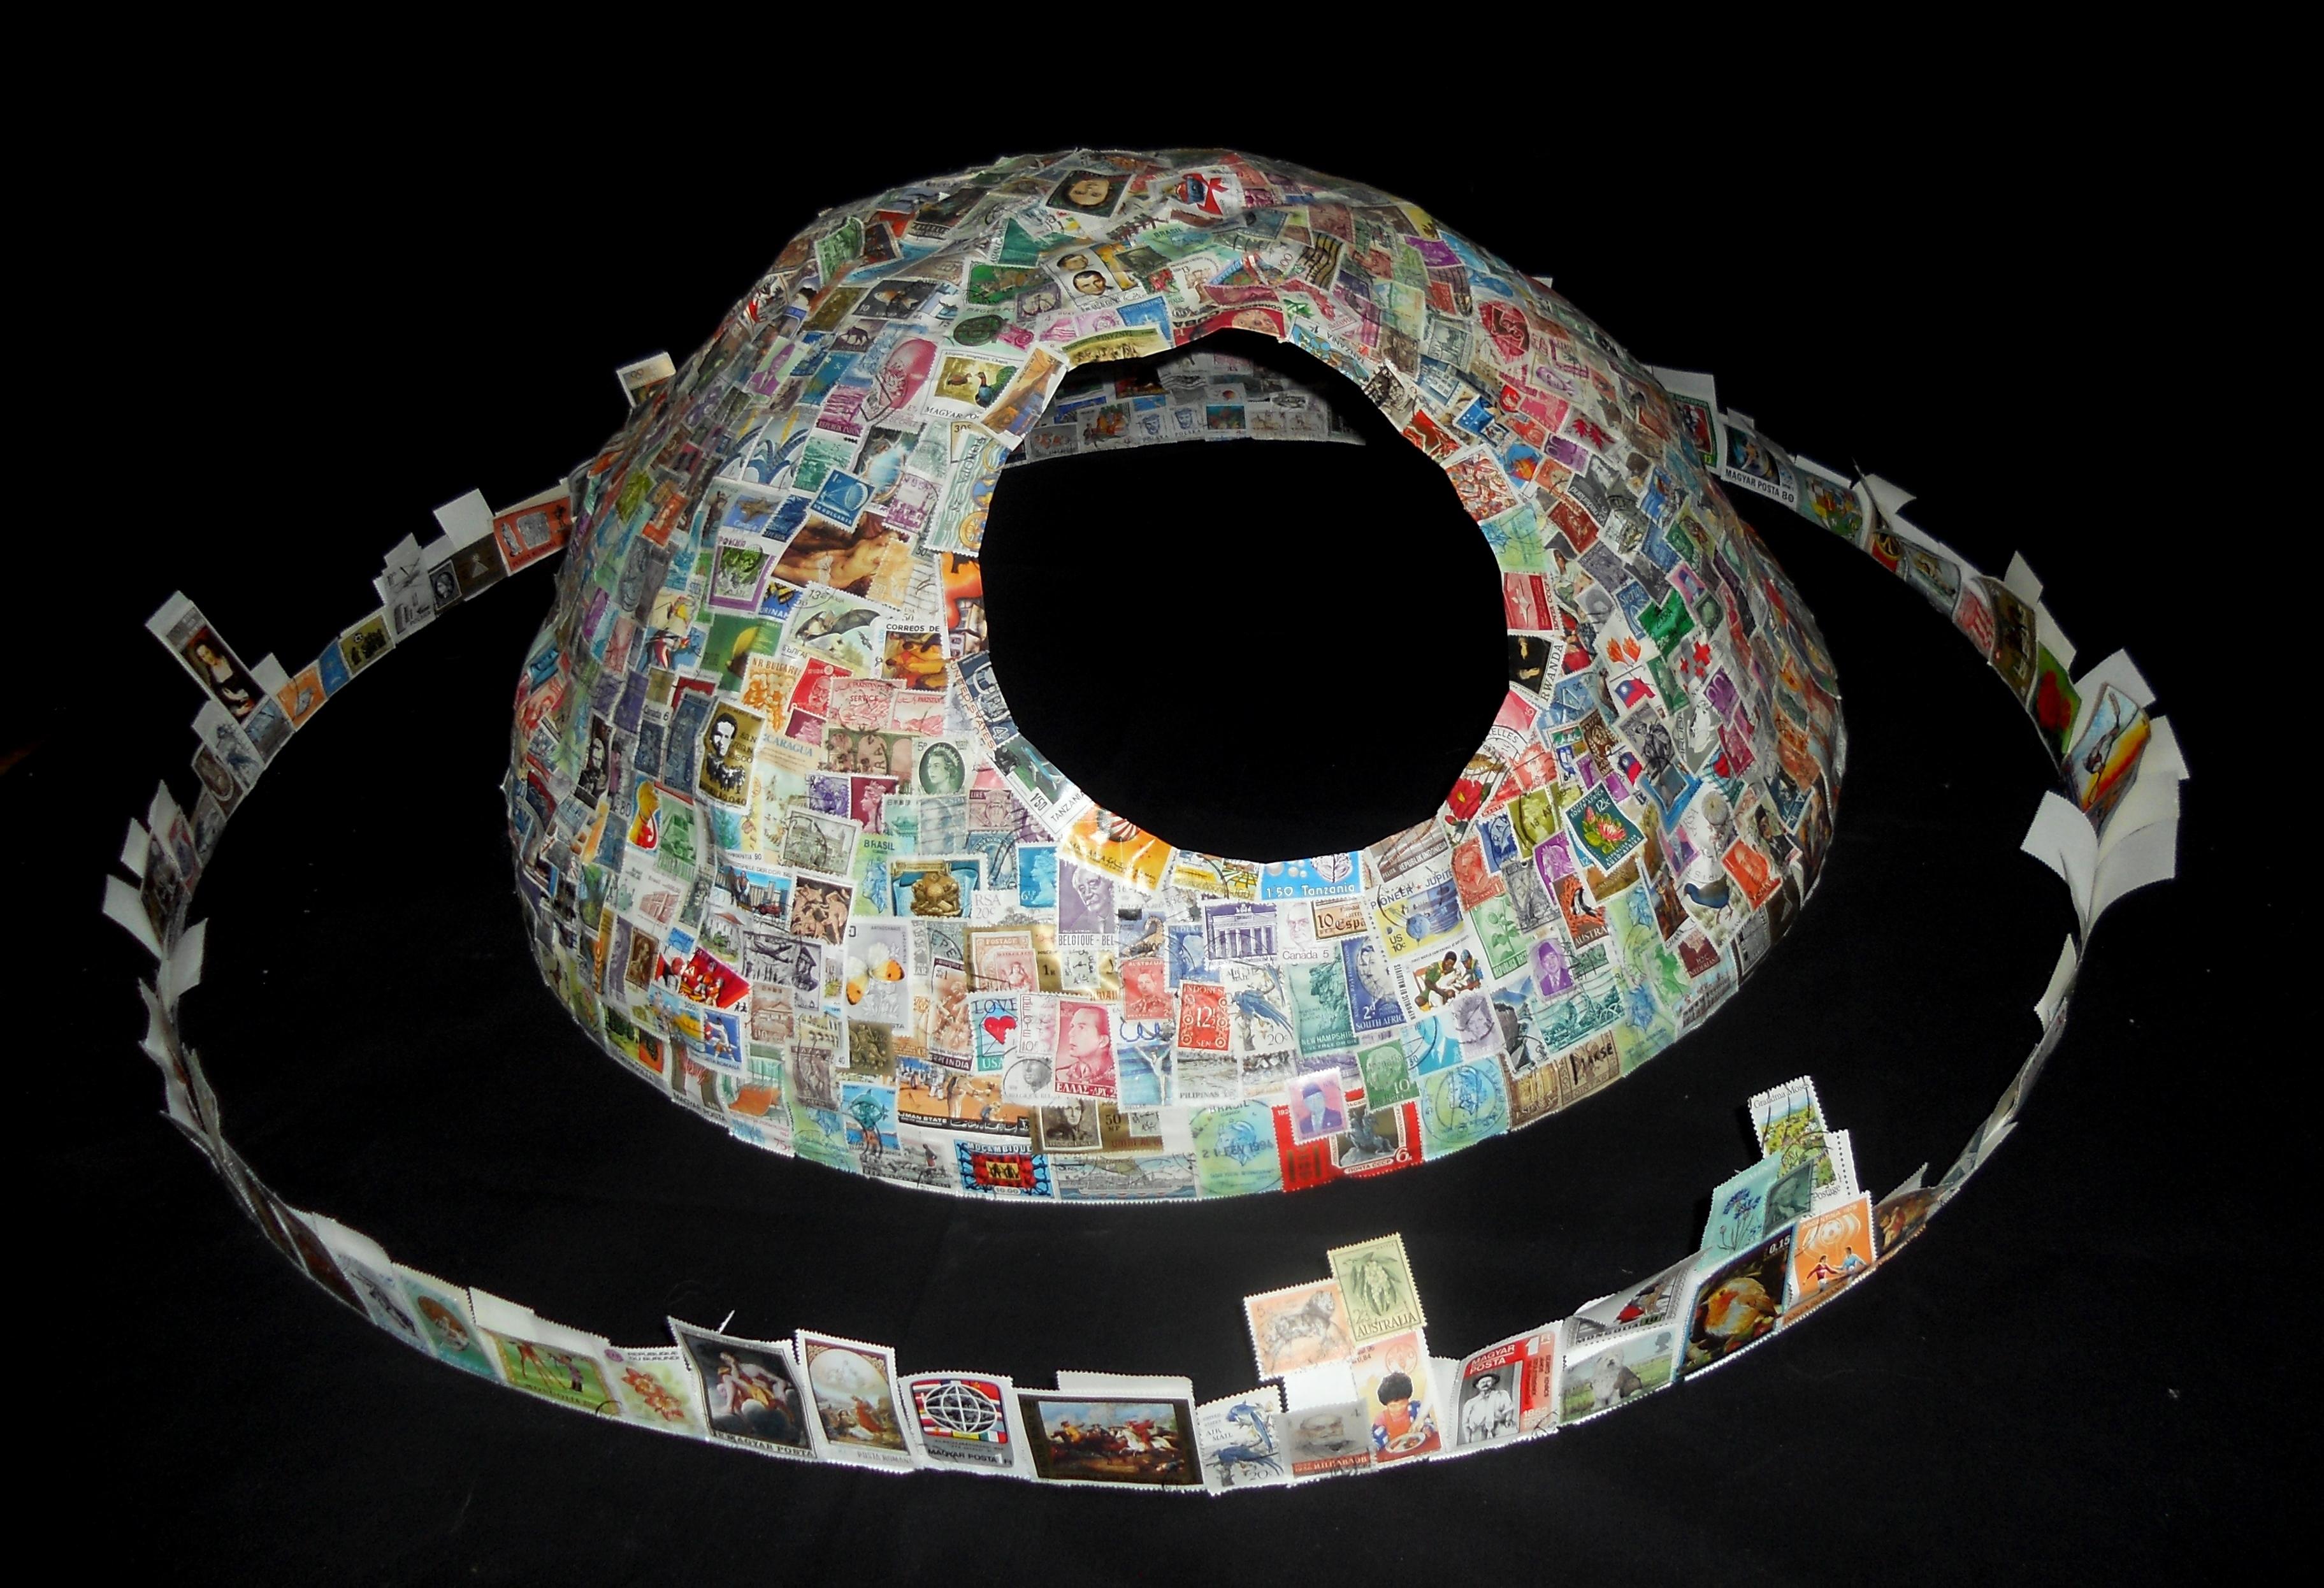 grensloos kunstverkennen 2011